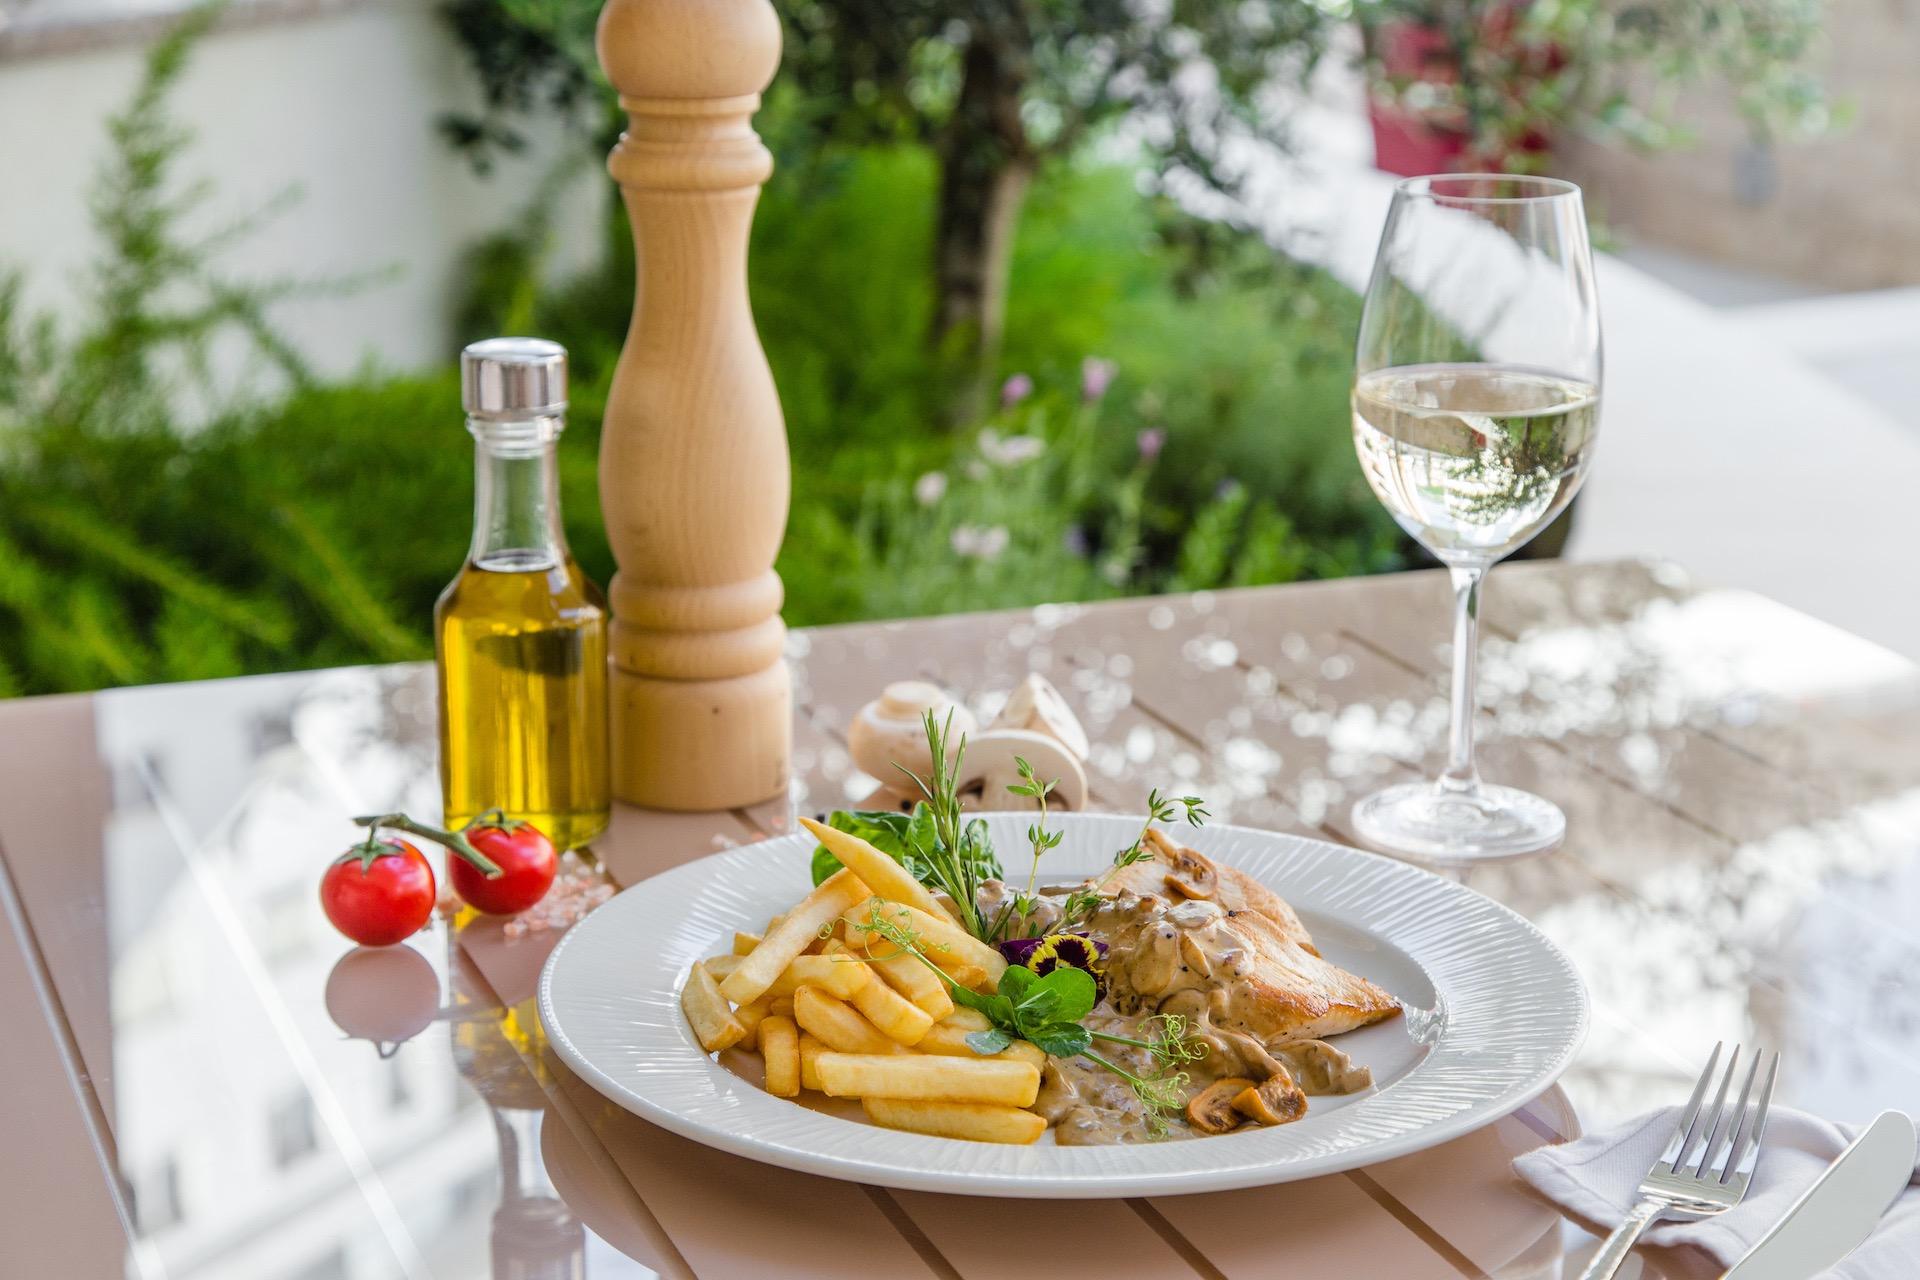 Restaurant Anatolia lounge cafe becici montenegro budva poll 1.jpeg